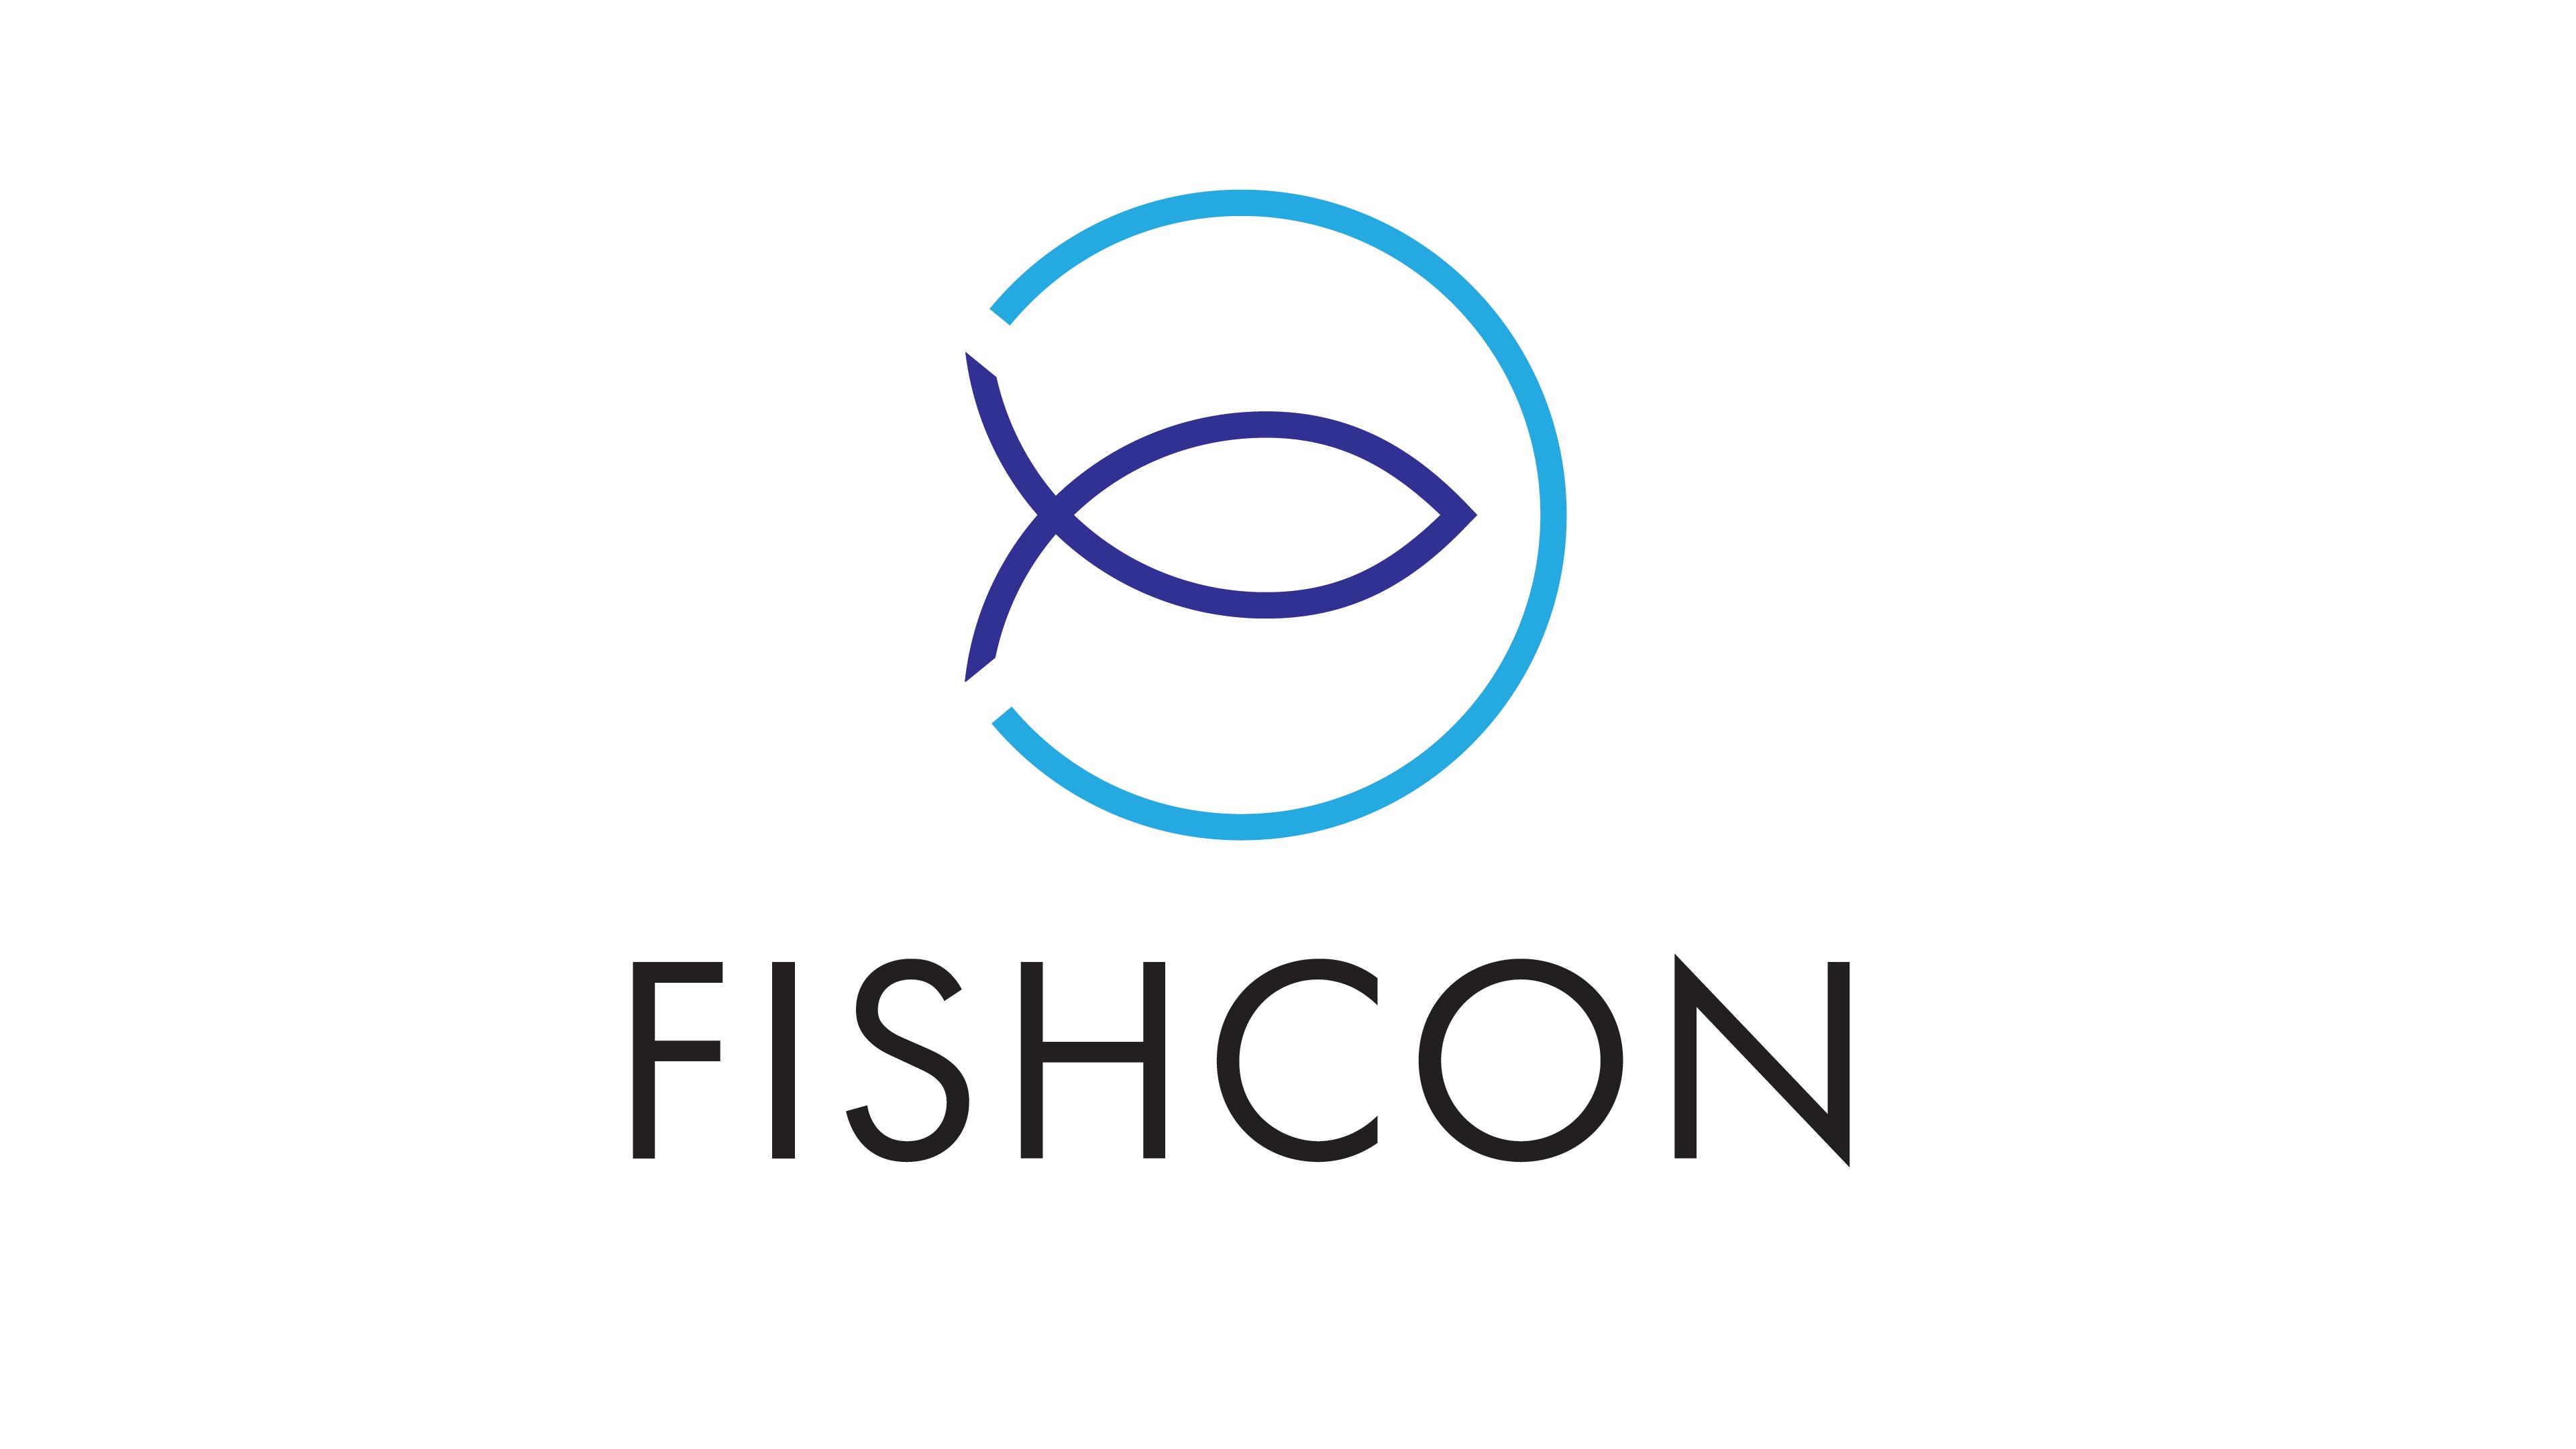 LOGO_FISHCON_hohe Auflösung